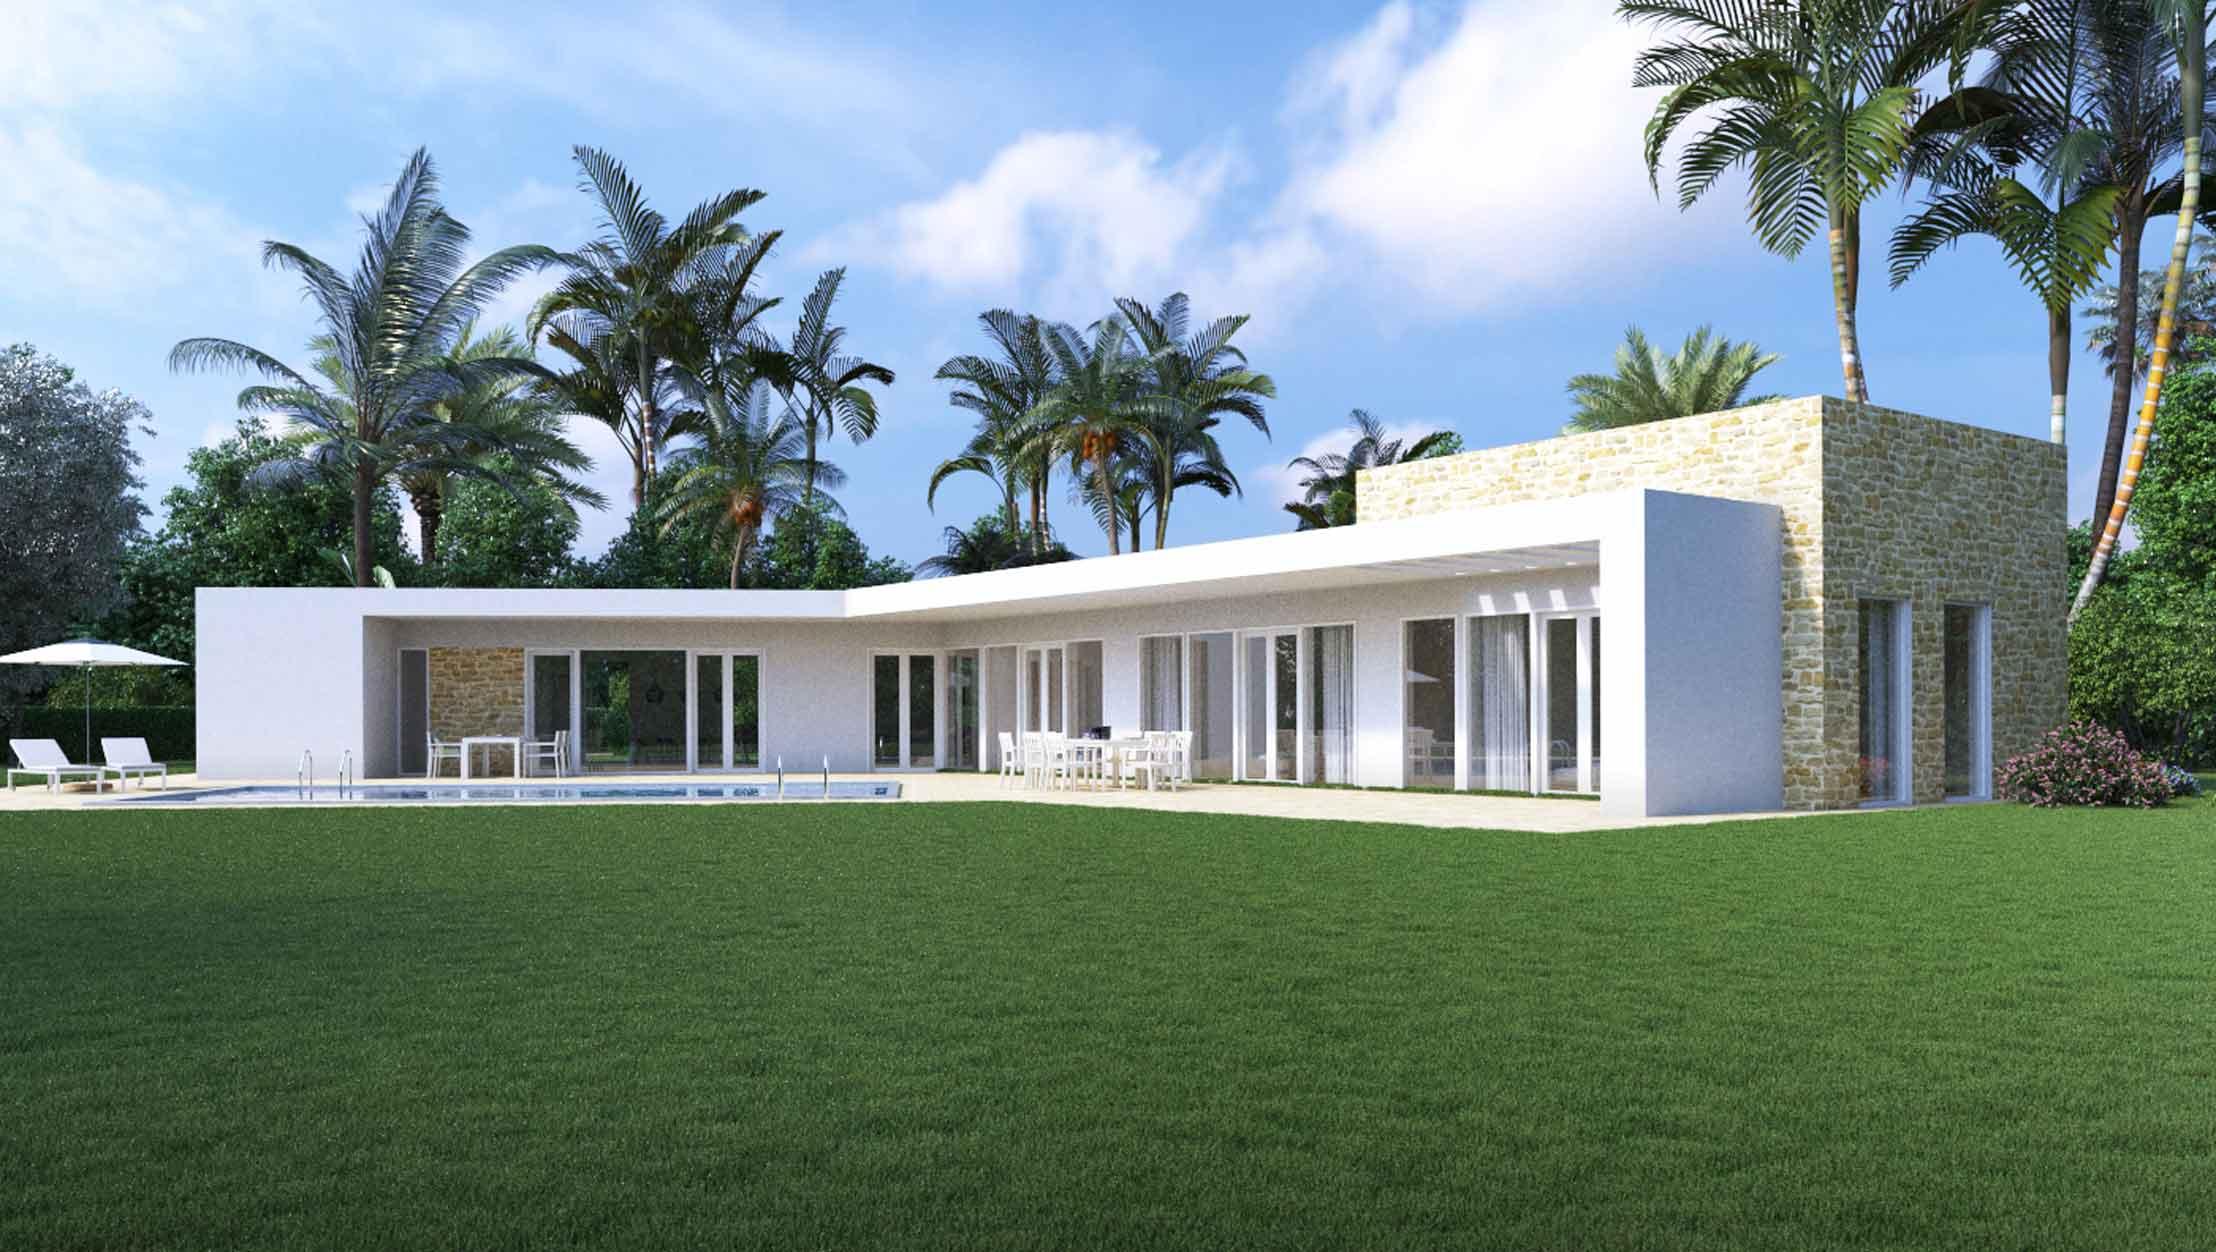 3 Bedrooms Superior Villa - Reference: SV-02